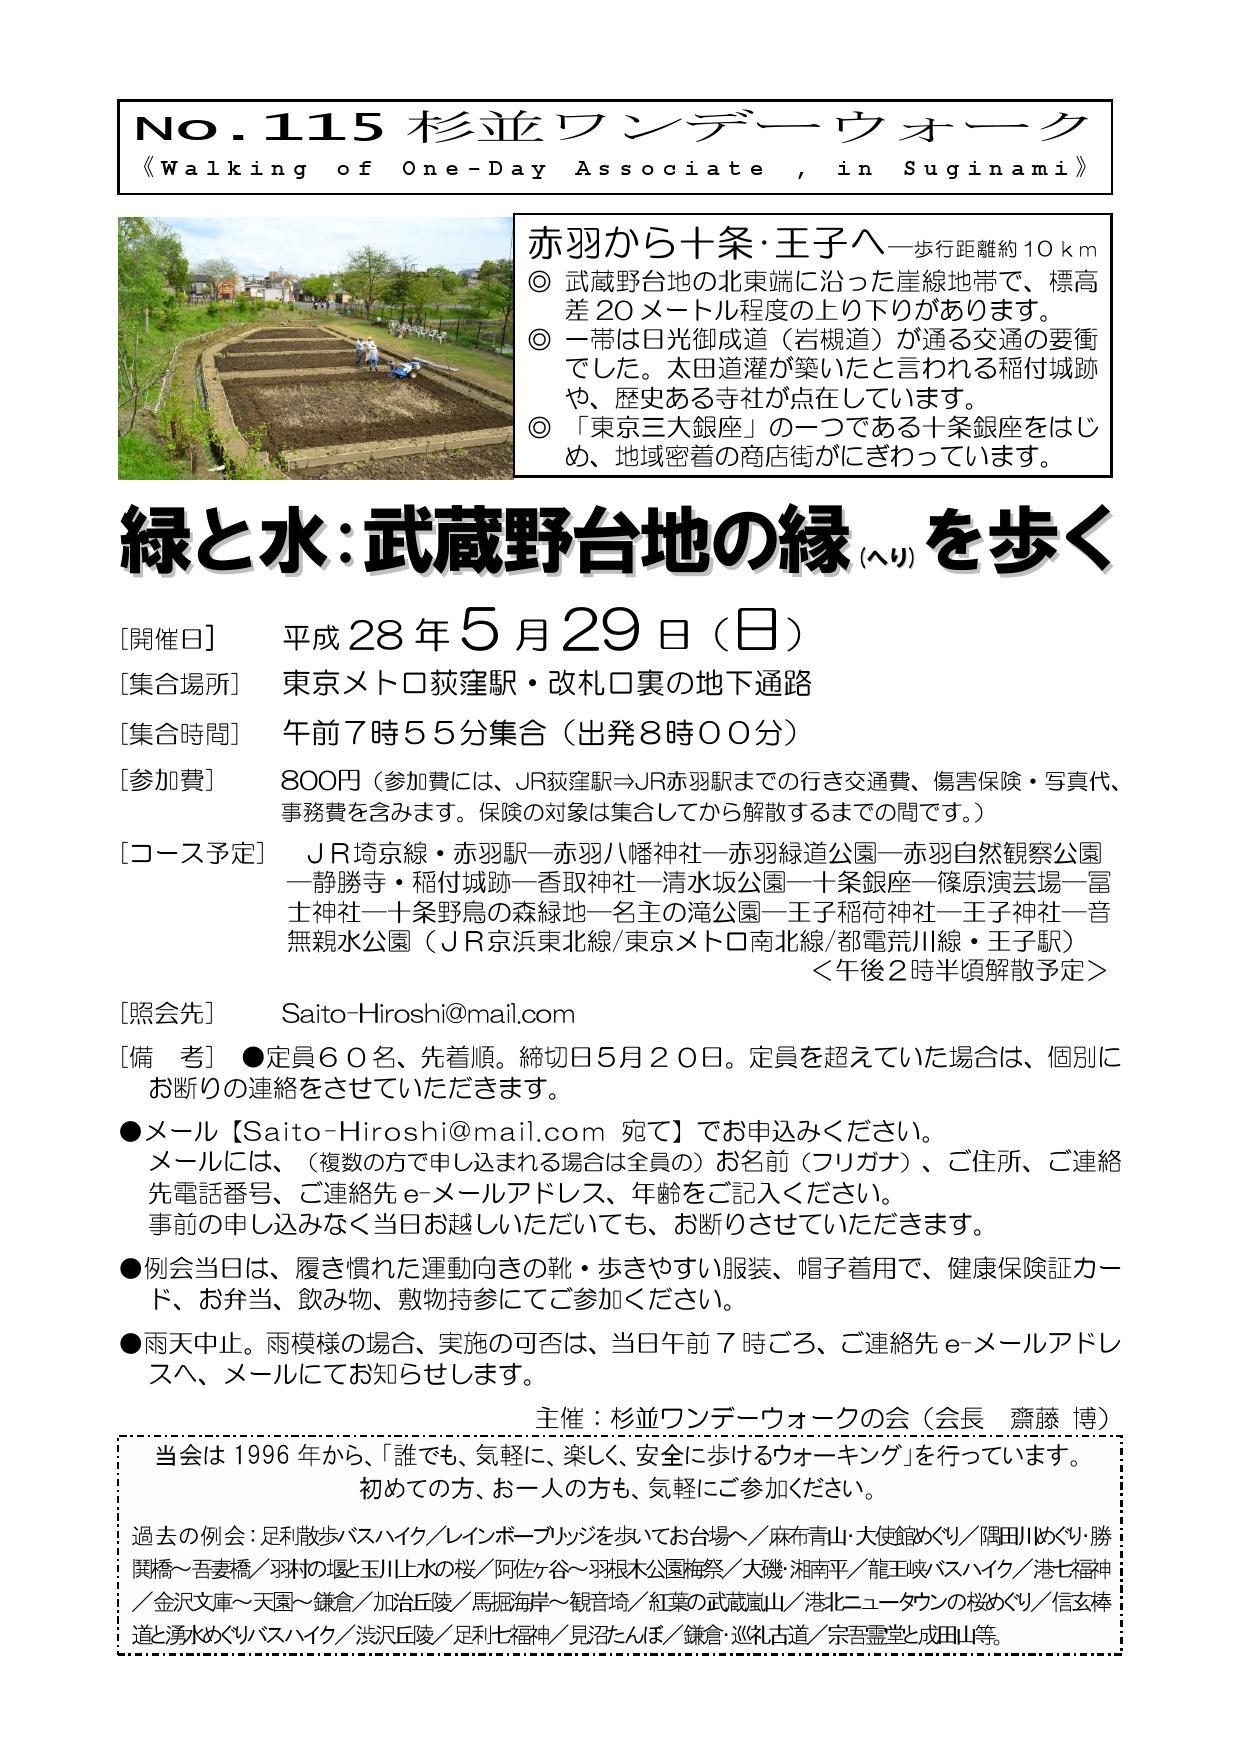 No115-緑と水:武蔵野台地の縁を歩く-ちらしver_web0001